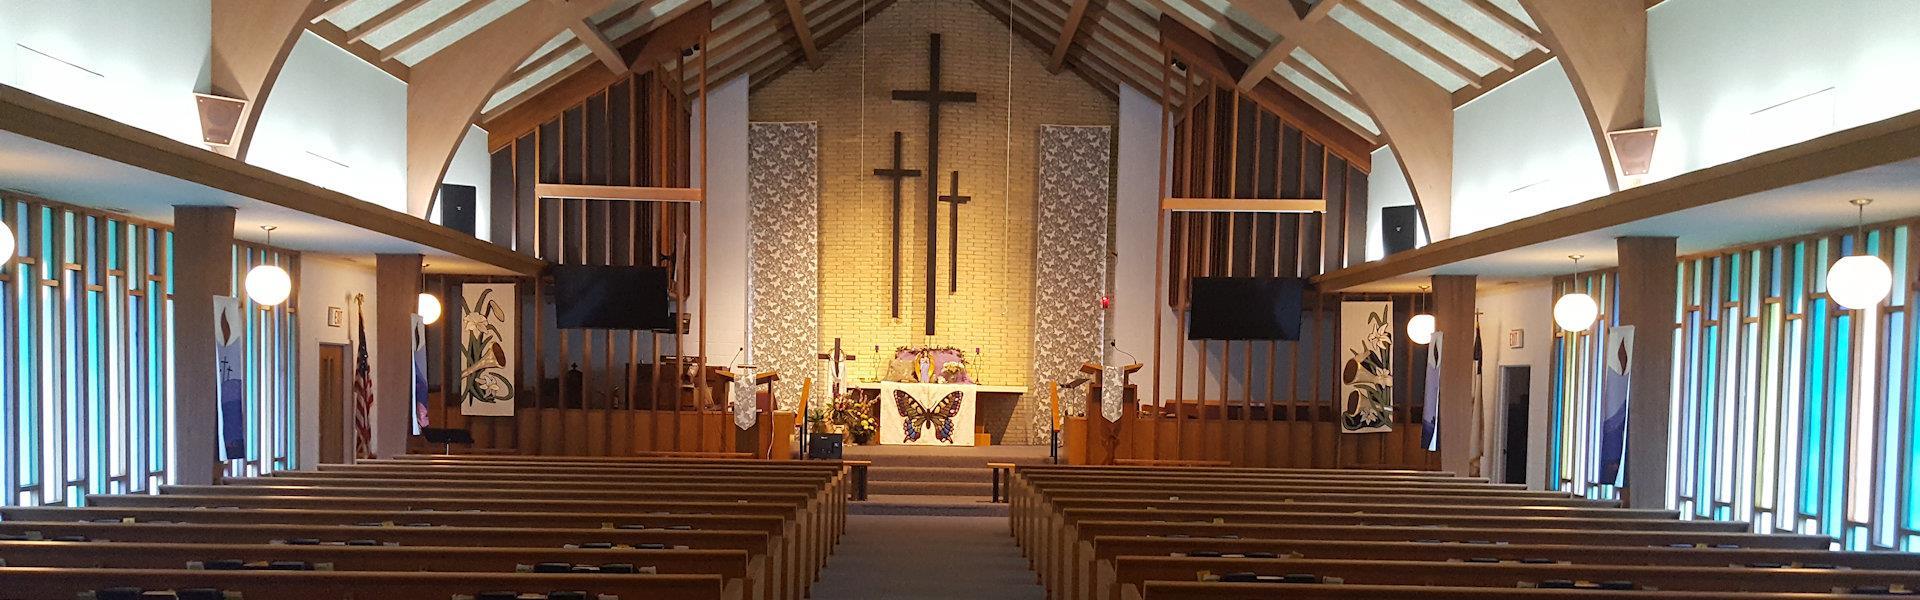 Staves Church Sanctuary 1920 x 600